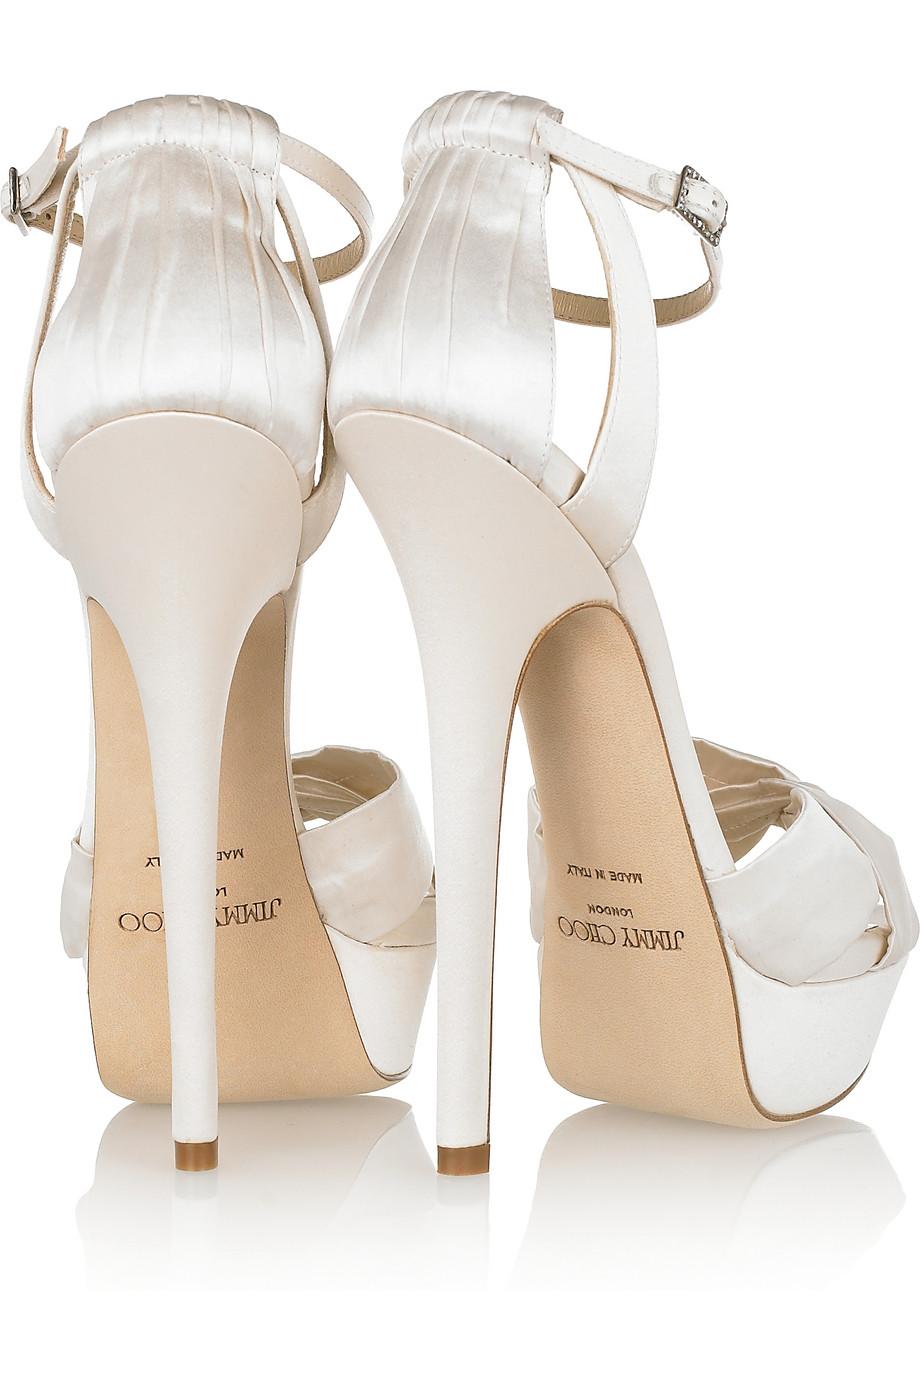 2ac7e2ee92b Lyst - Jimmy Choo Fairy Satin Platform Sandals in White